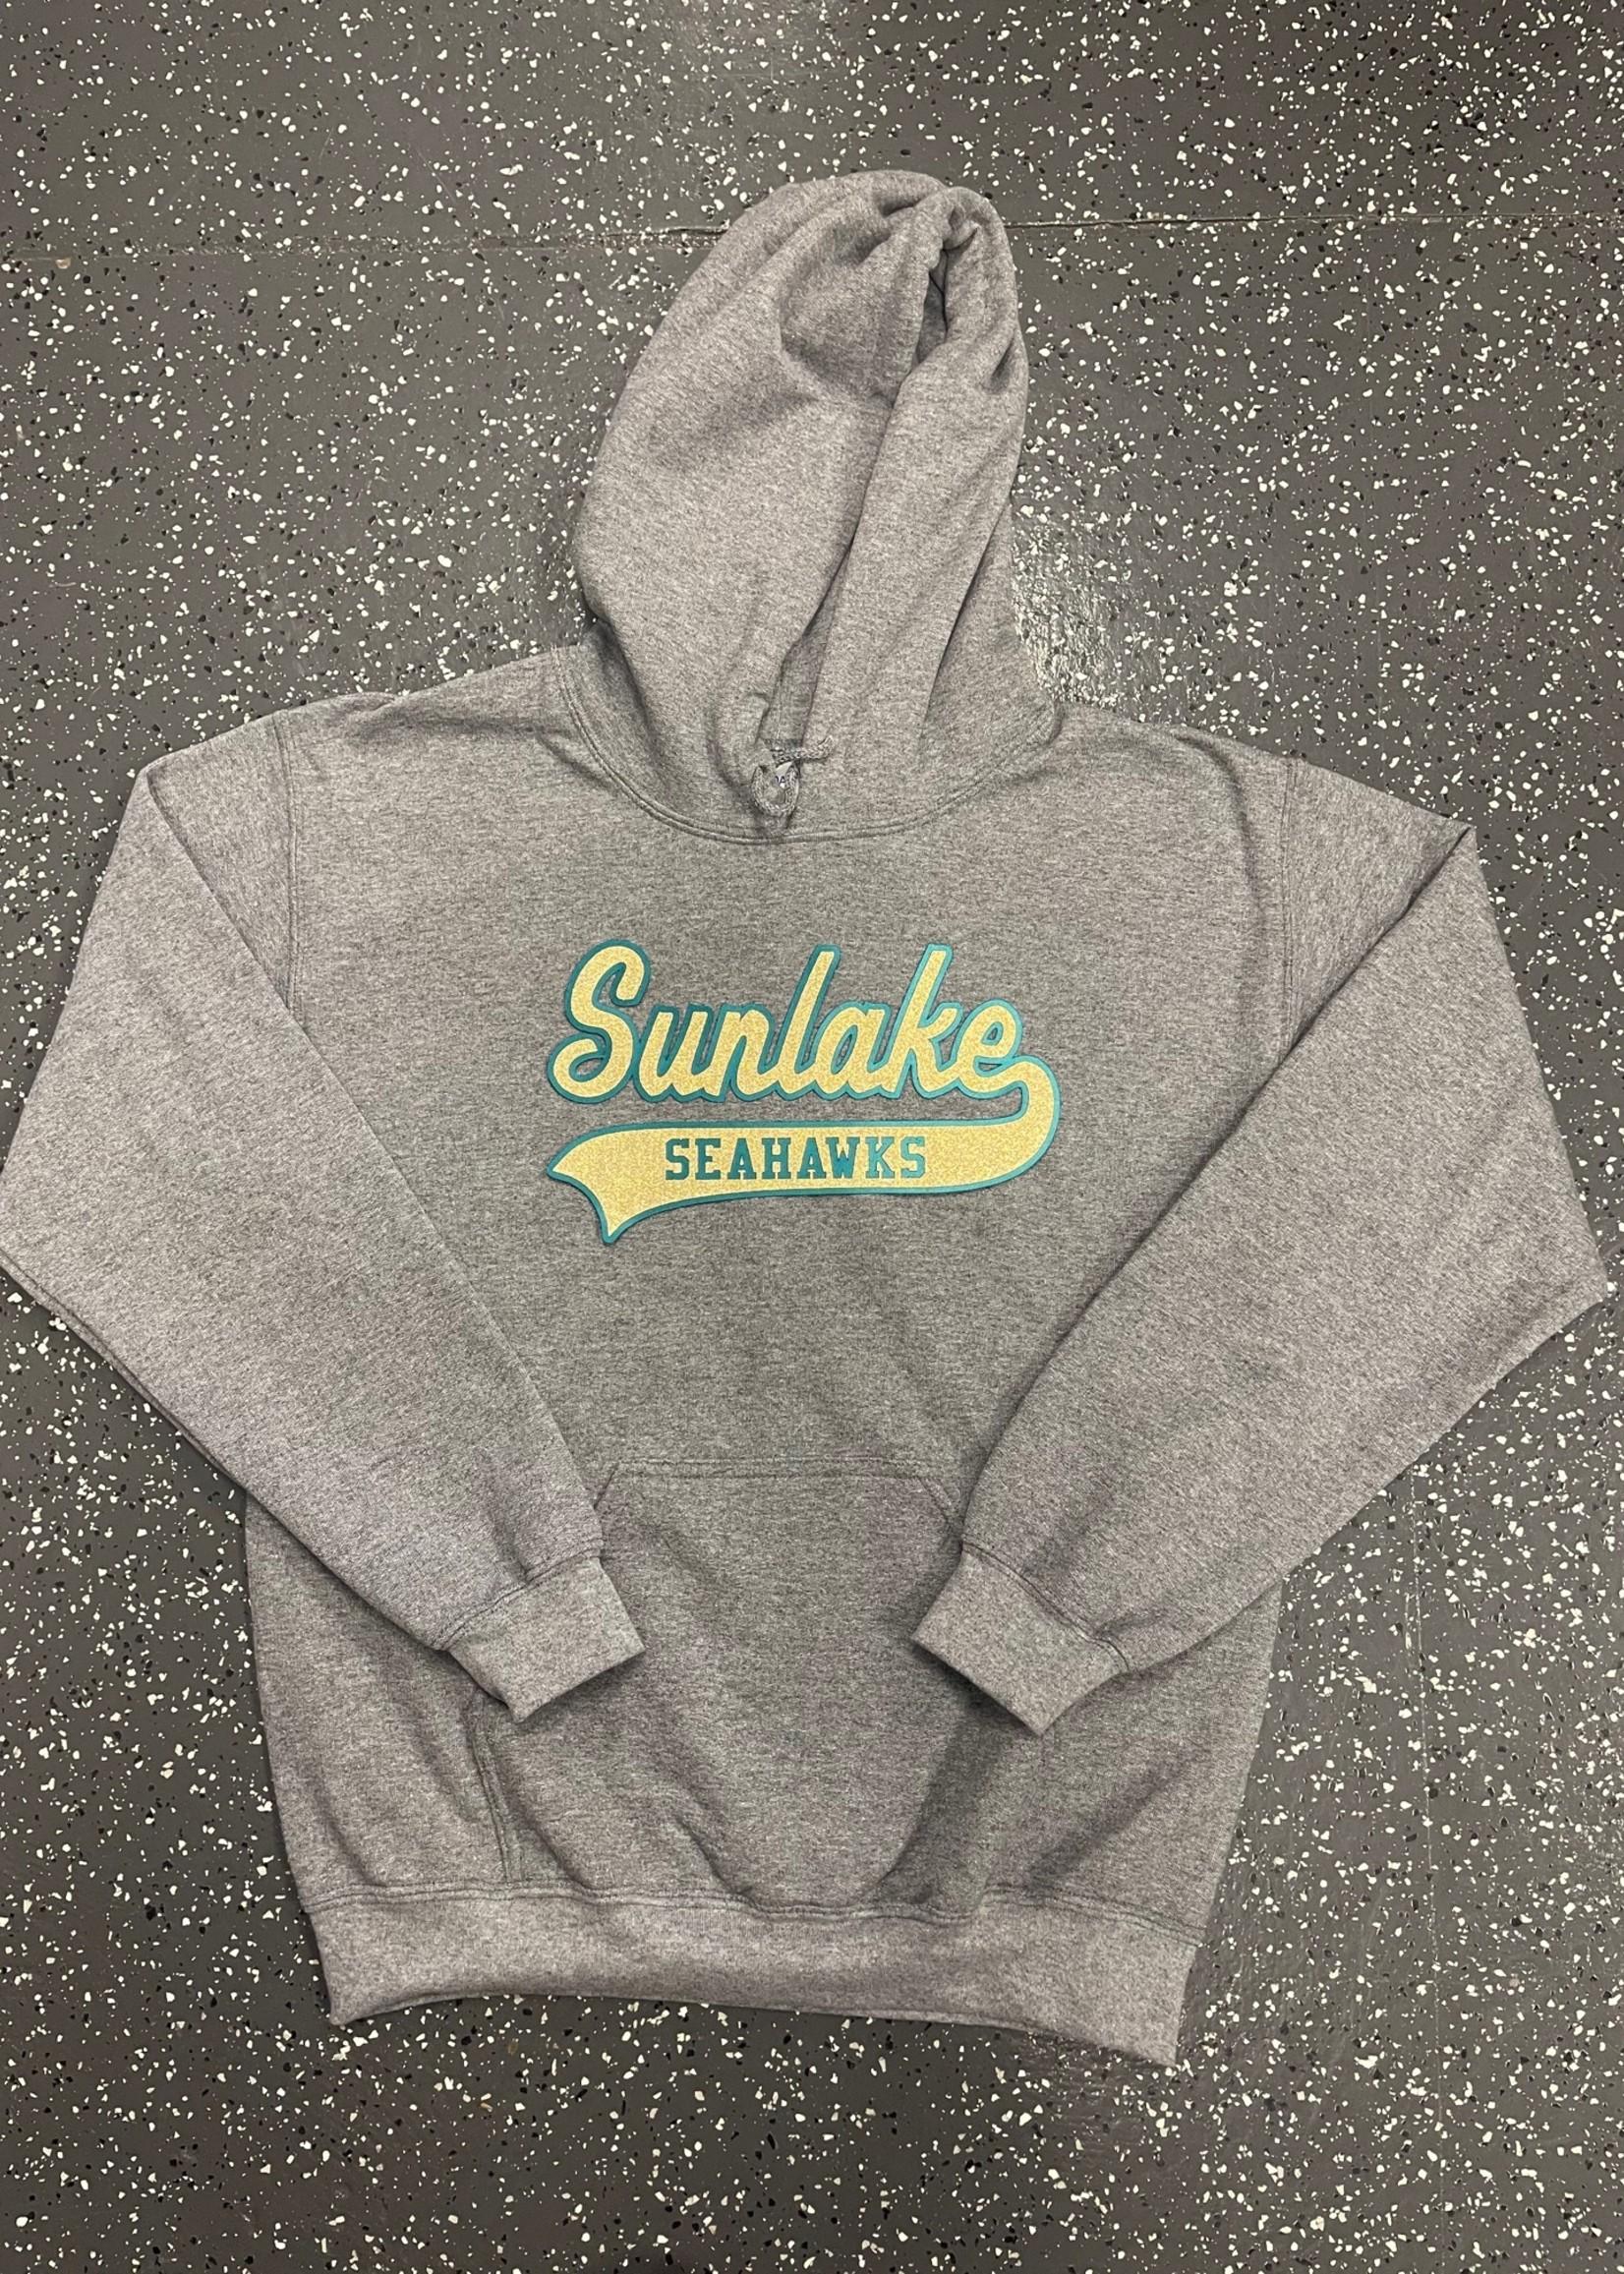 Sunlake Graphite Heather No-Sew Custom Hoodie